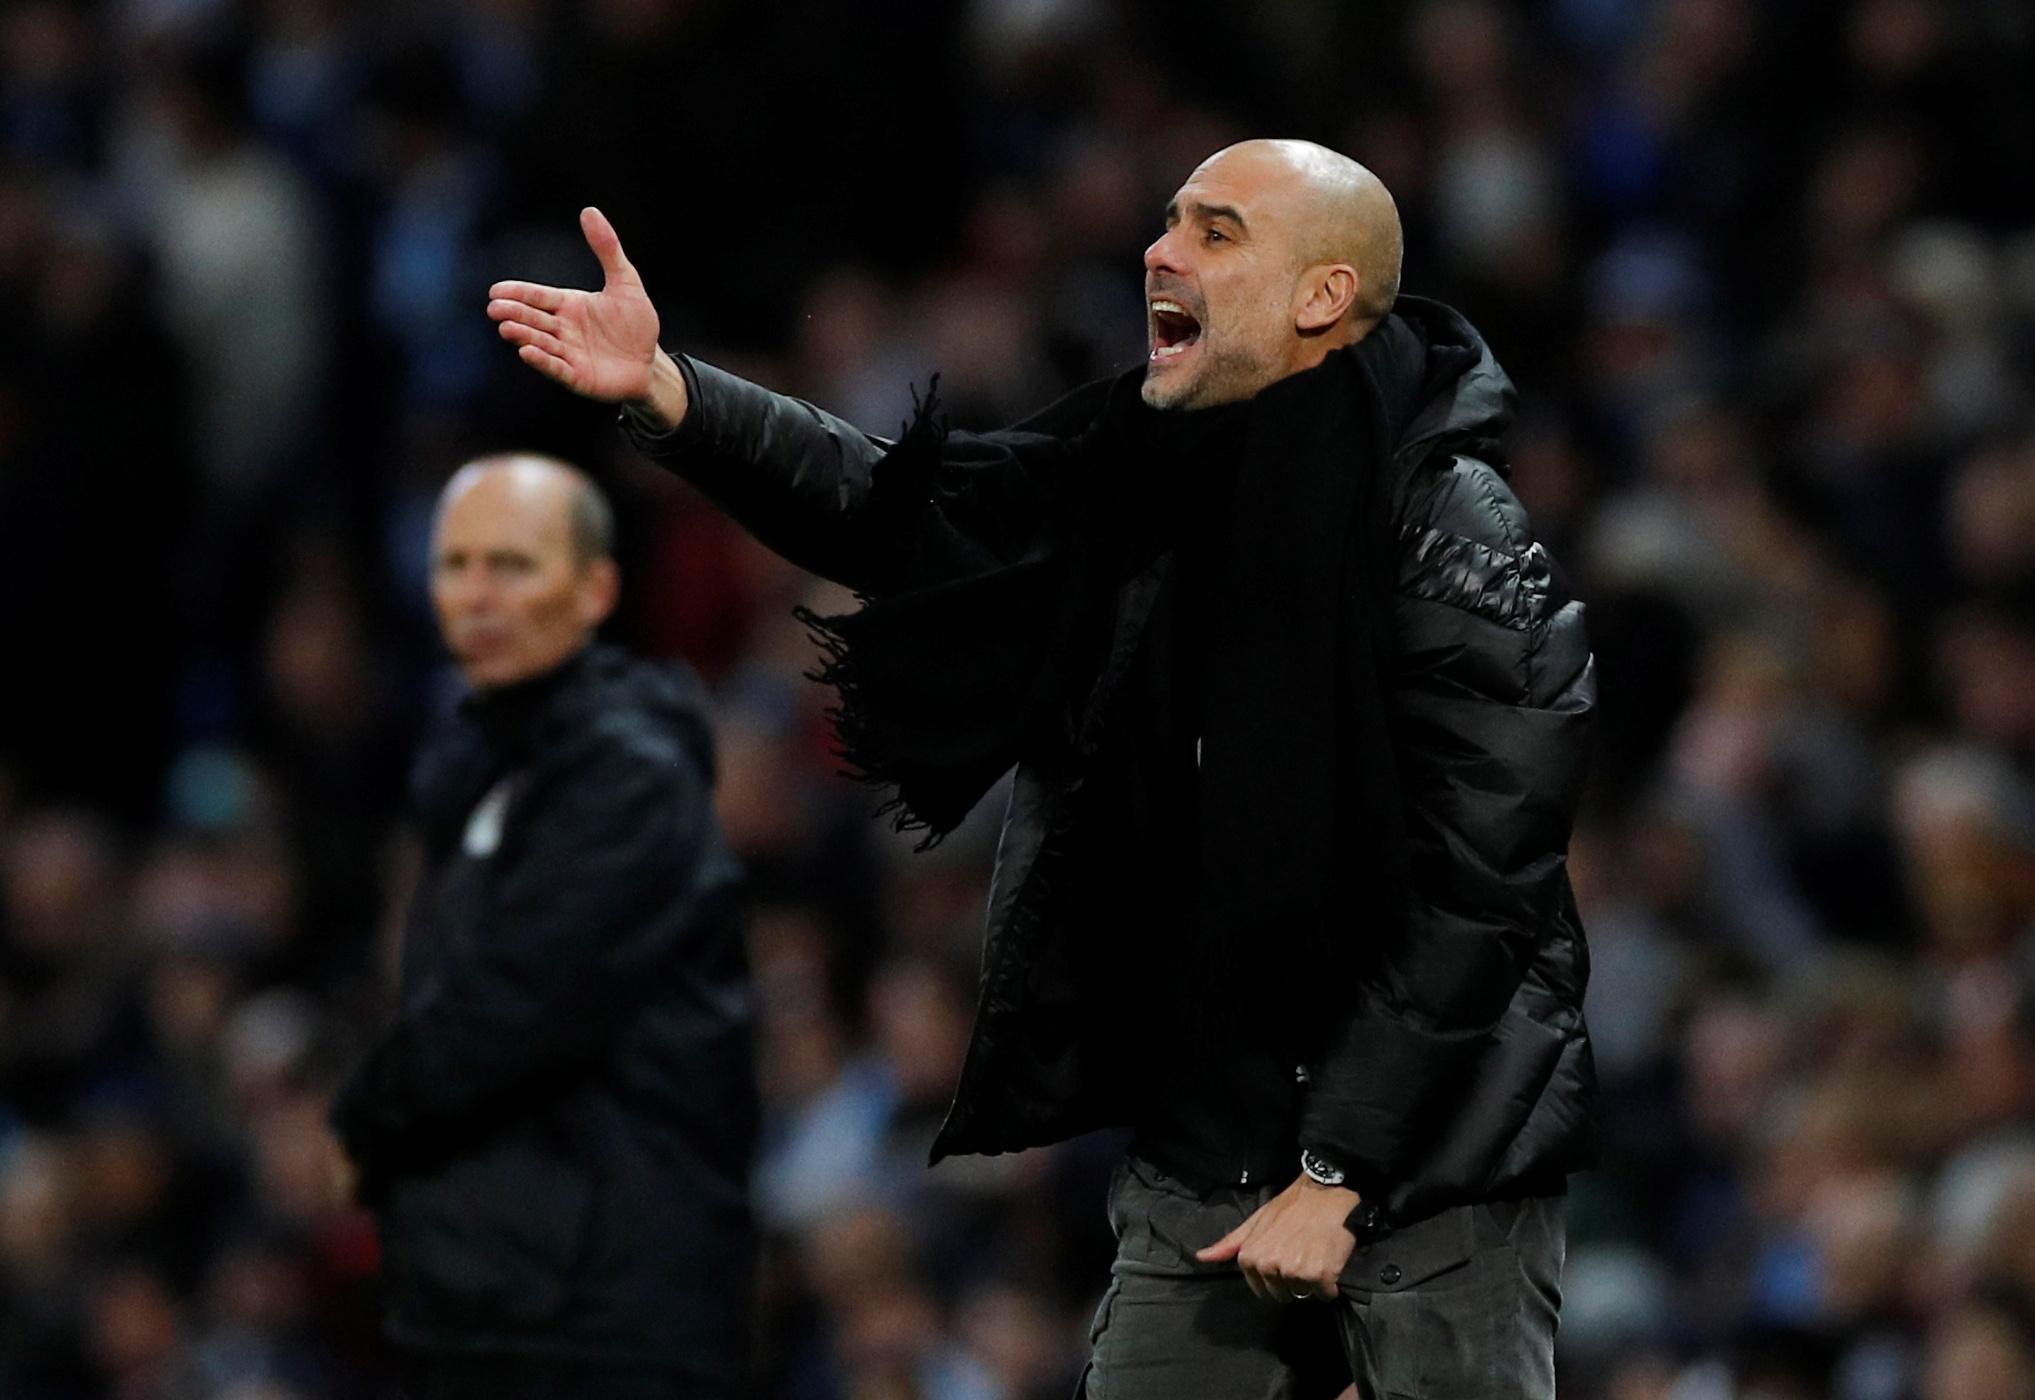 Man City not on par with European elite, says Guardiola